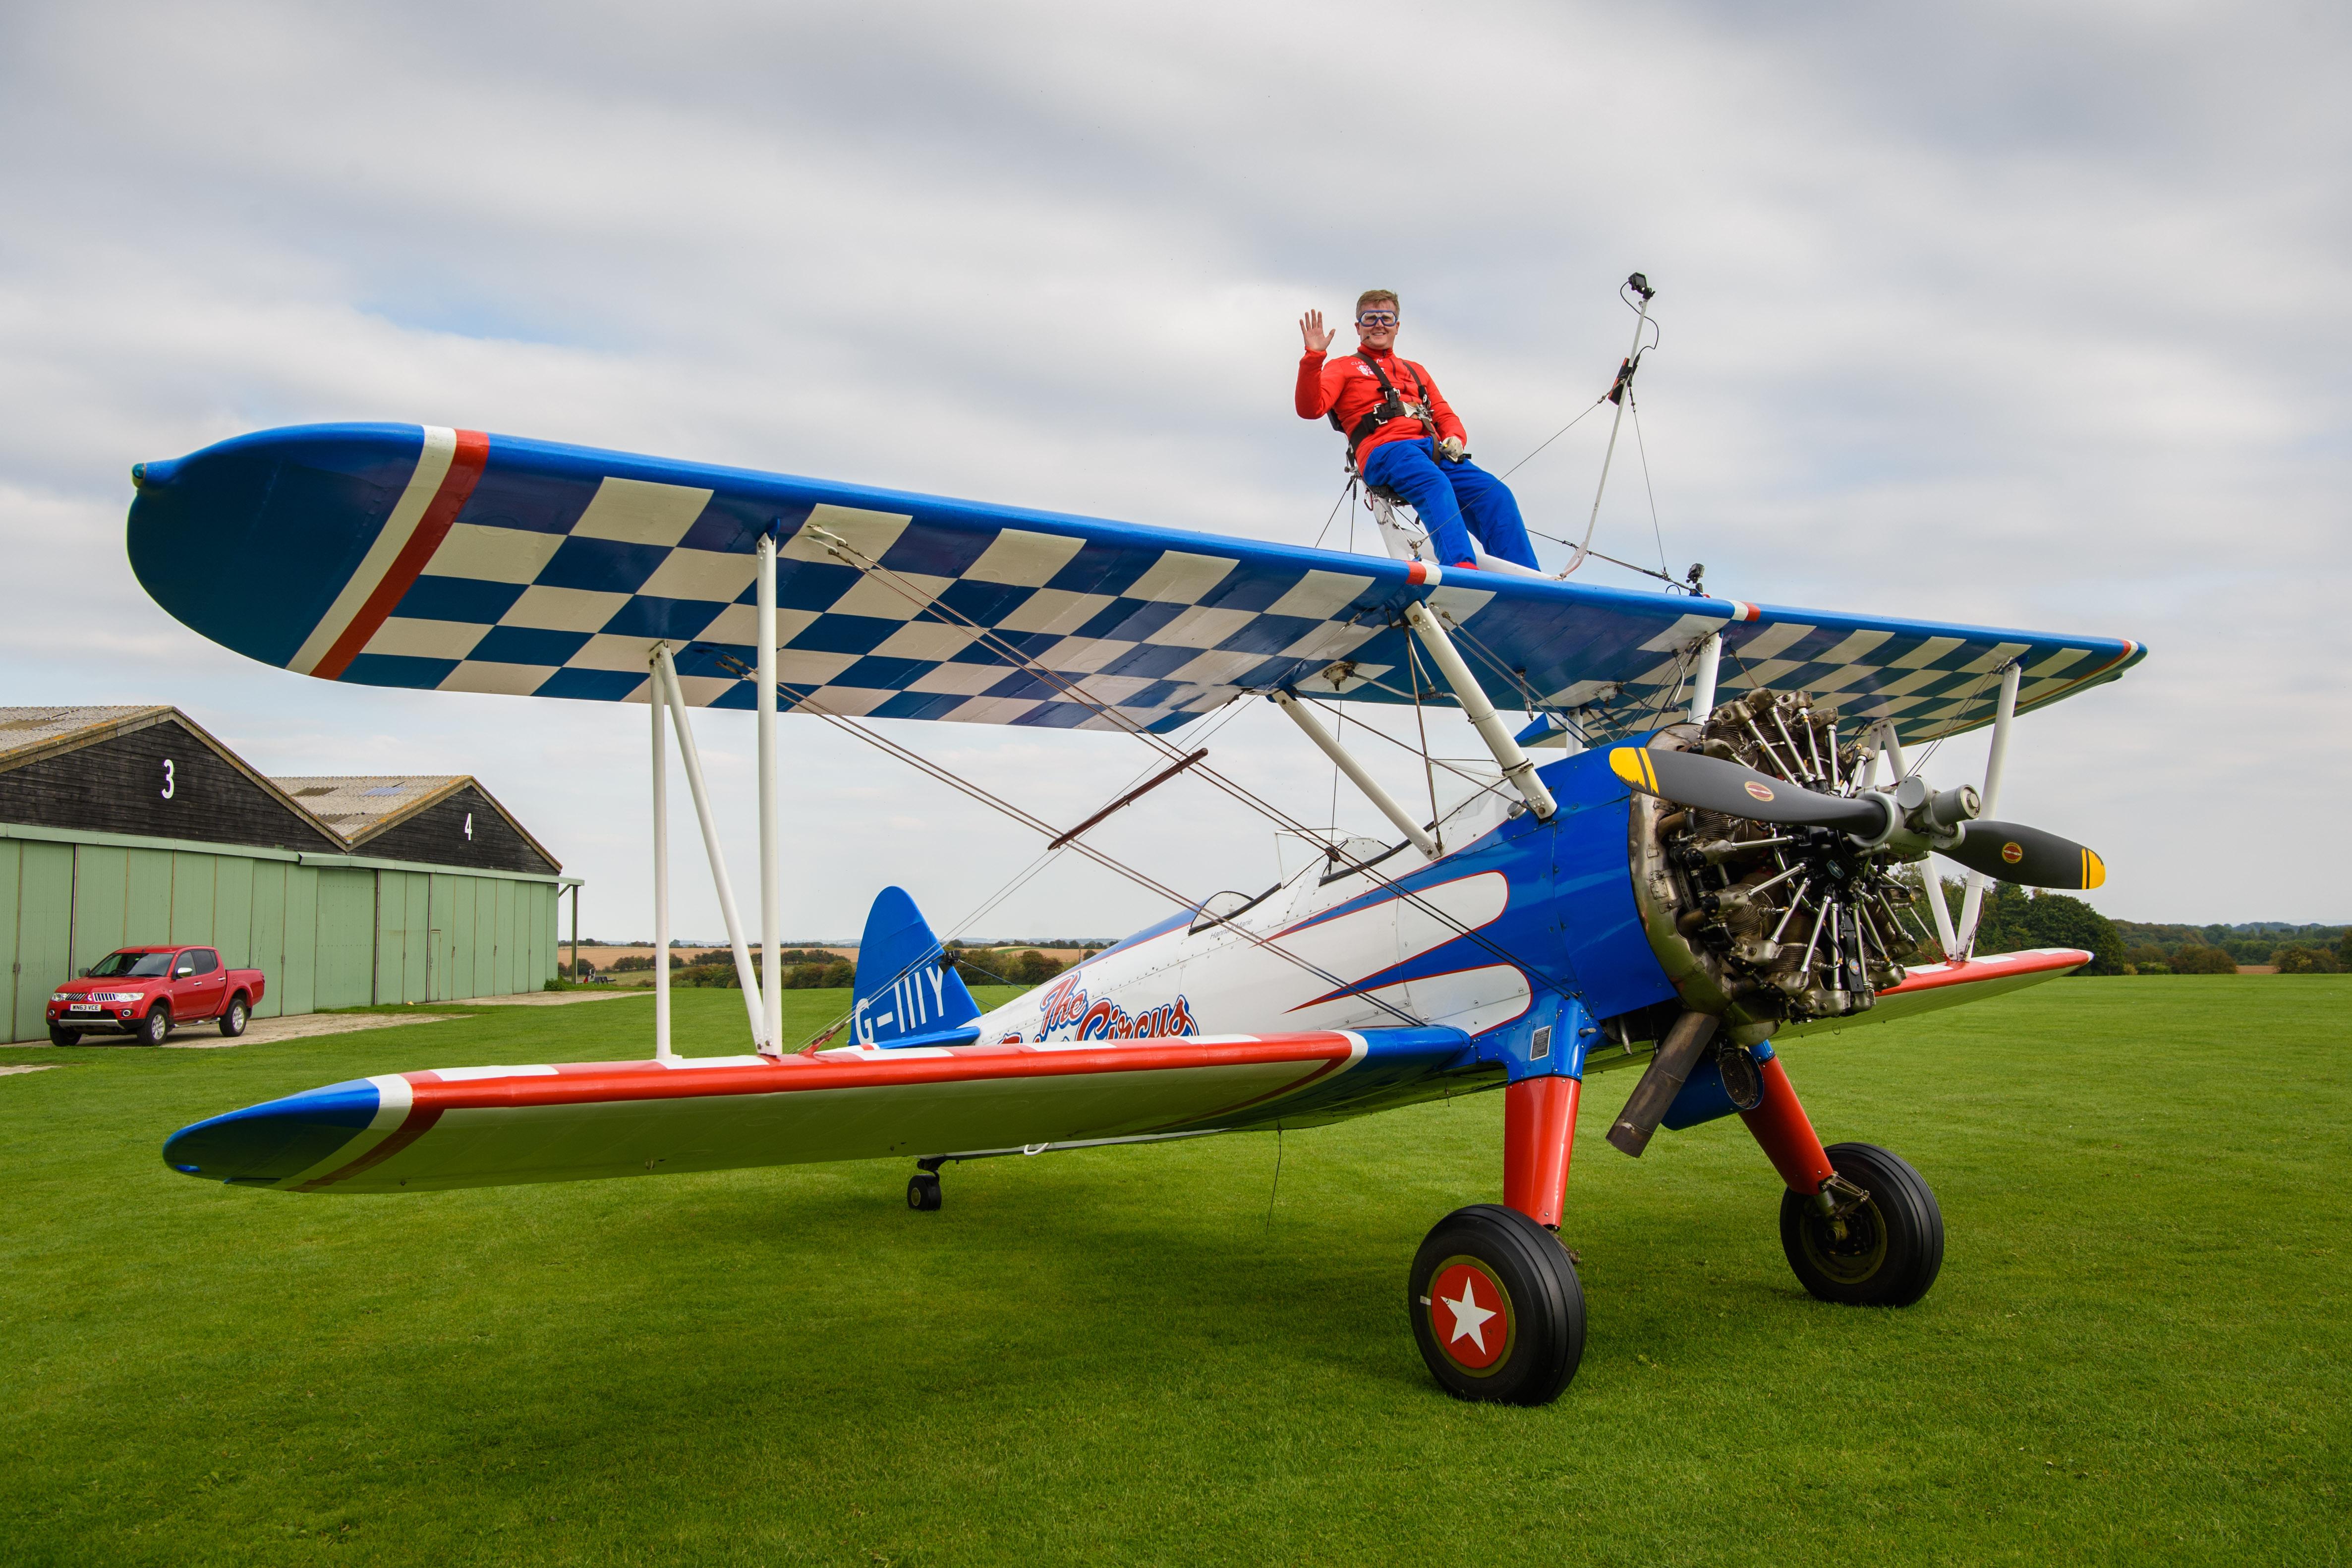 Aled Jones Completes his Epic Wing Walking Flight!